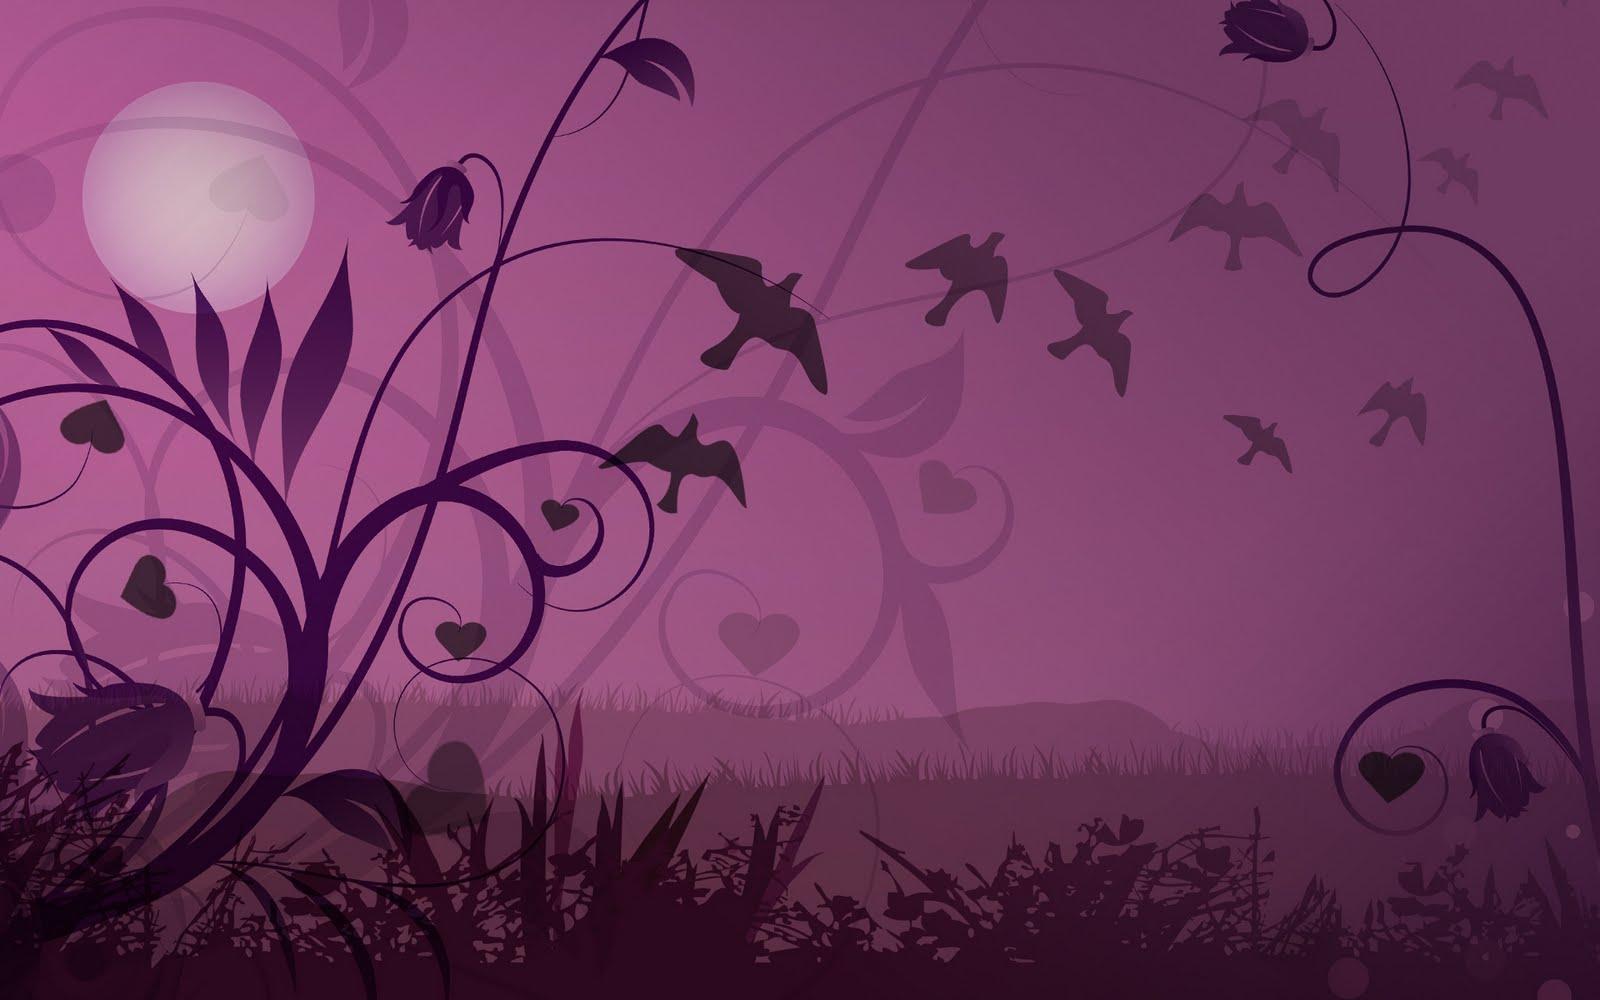 http://1.bp.blogspot.com/-wpkIuttzMY8/TagEY8XJfTI/AAAAAAAACFQ/DzojY3LHTmU/s1600/amazing+wallpaper+%252864%2529.jpg